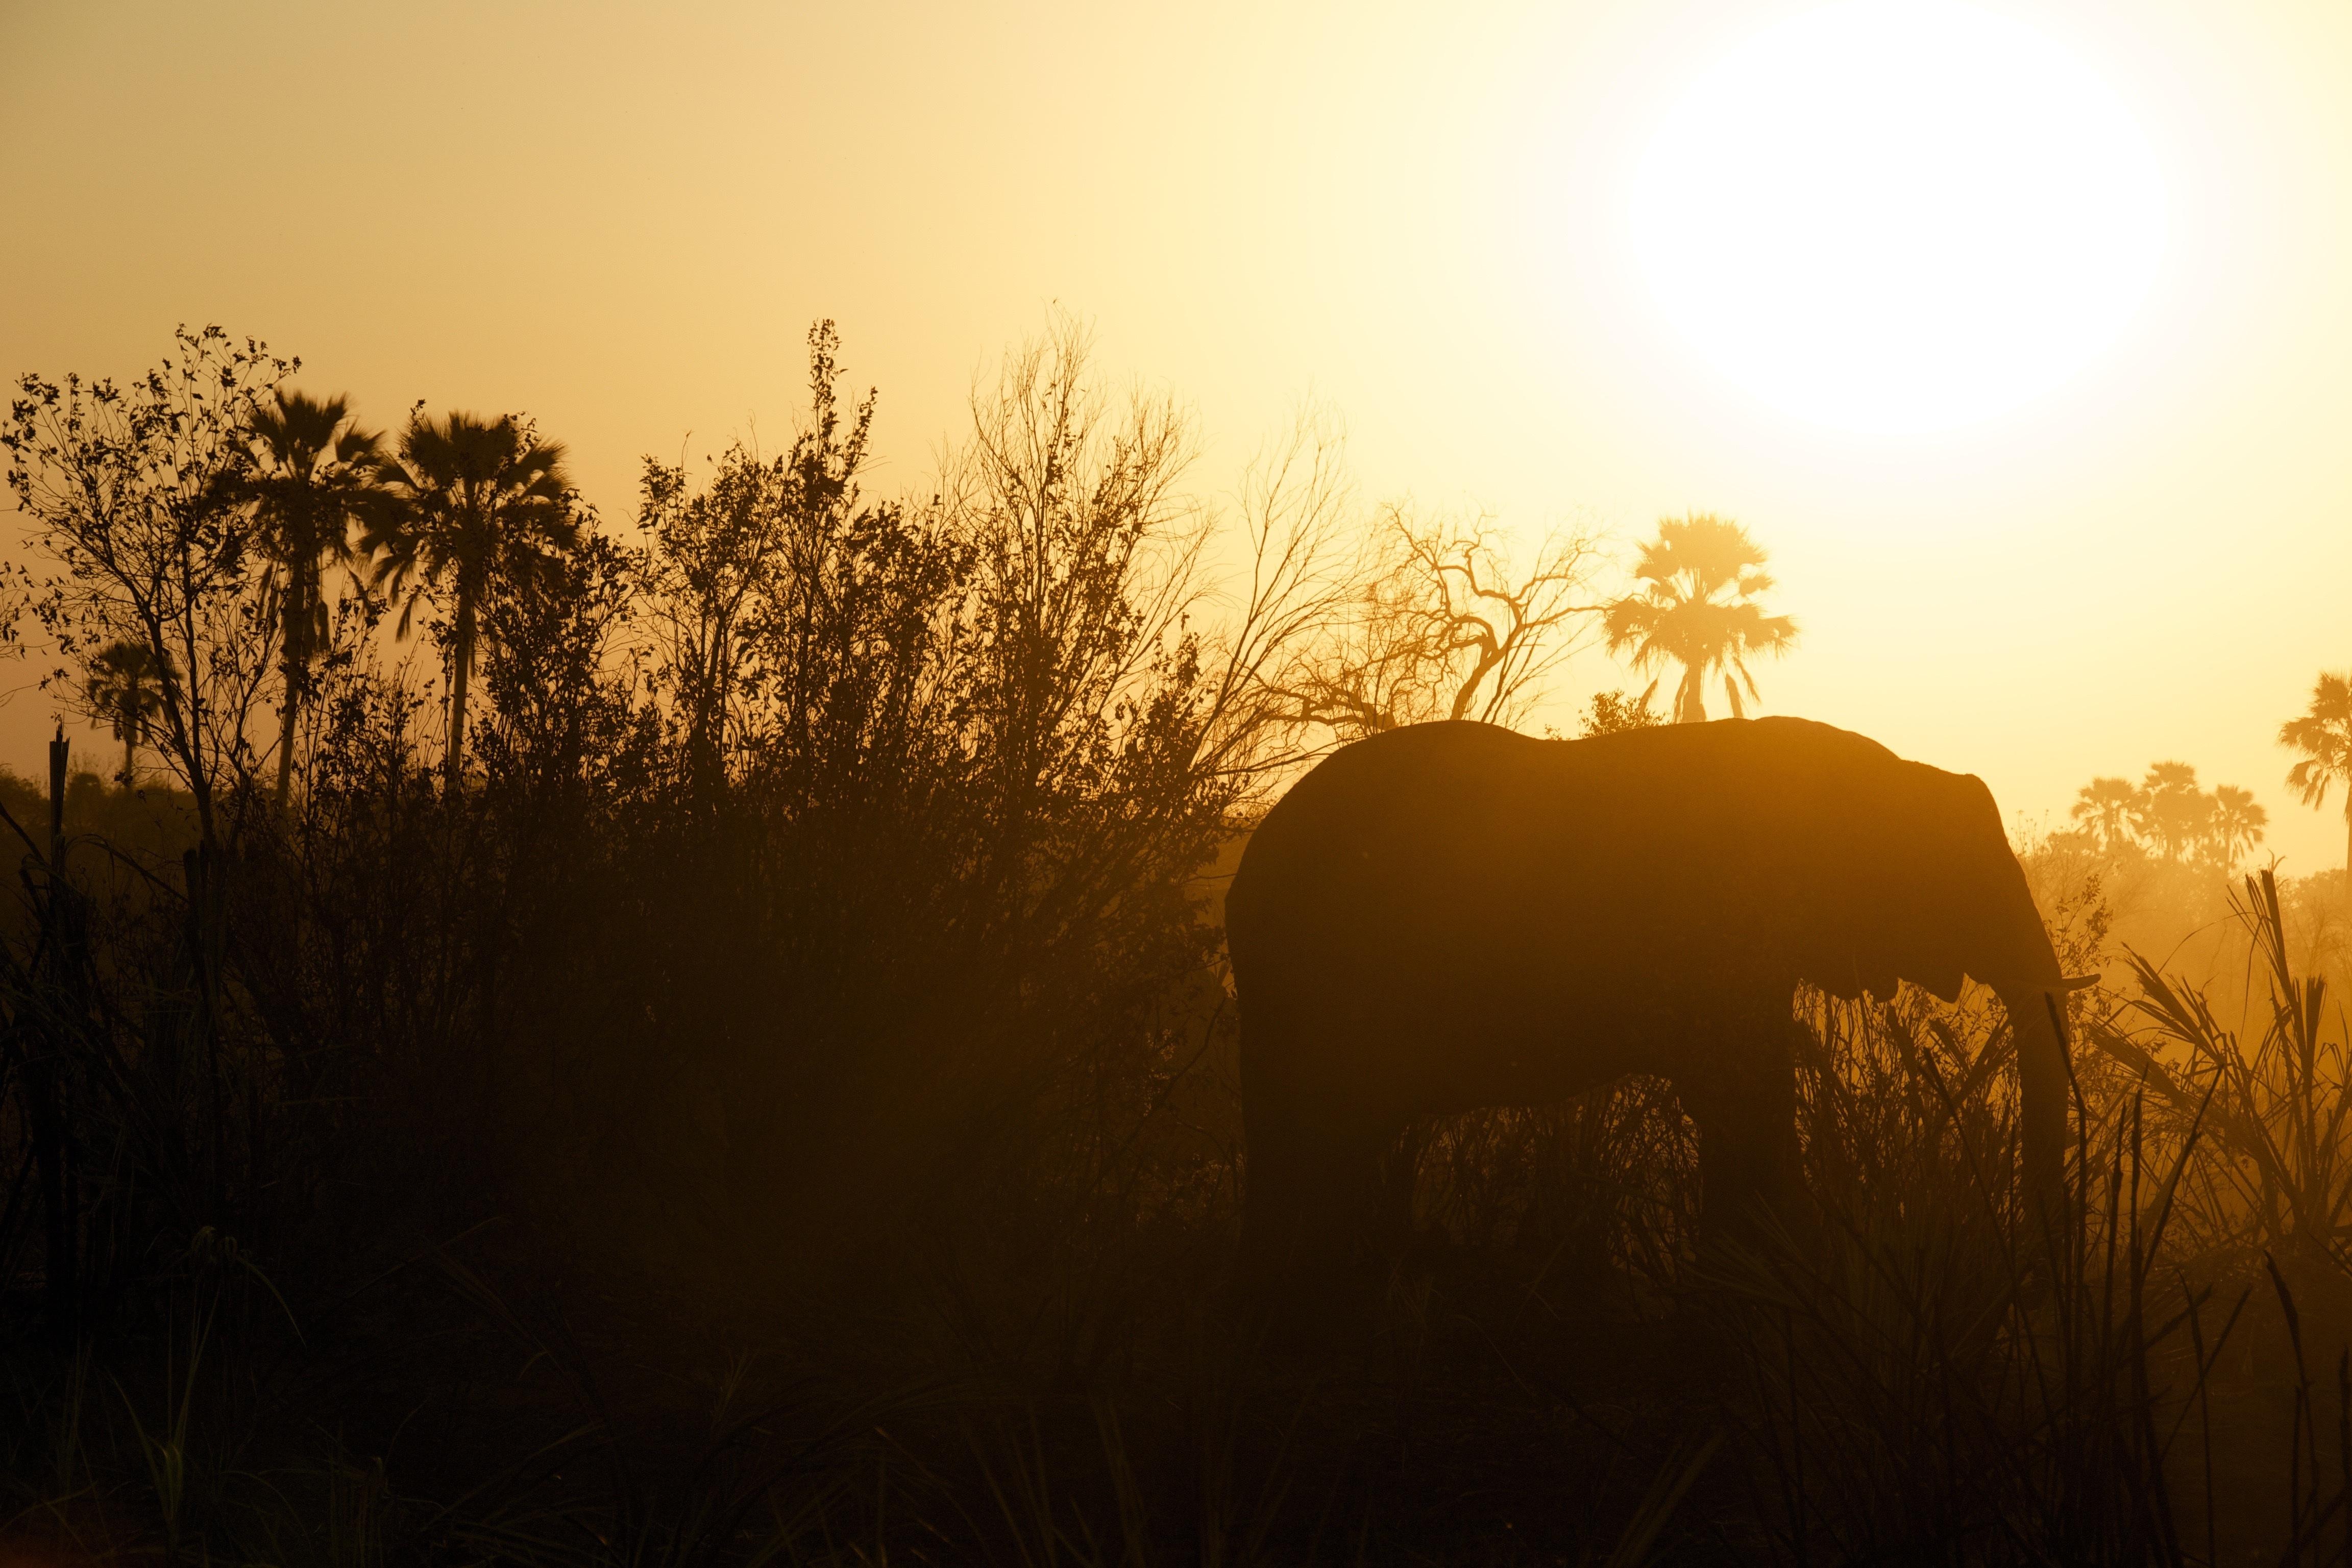 Silhouette of elephant, animals, large, mammals, wild, Africa, sun, sunset